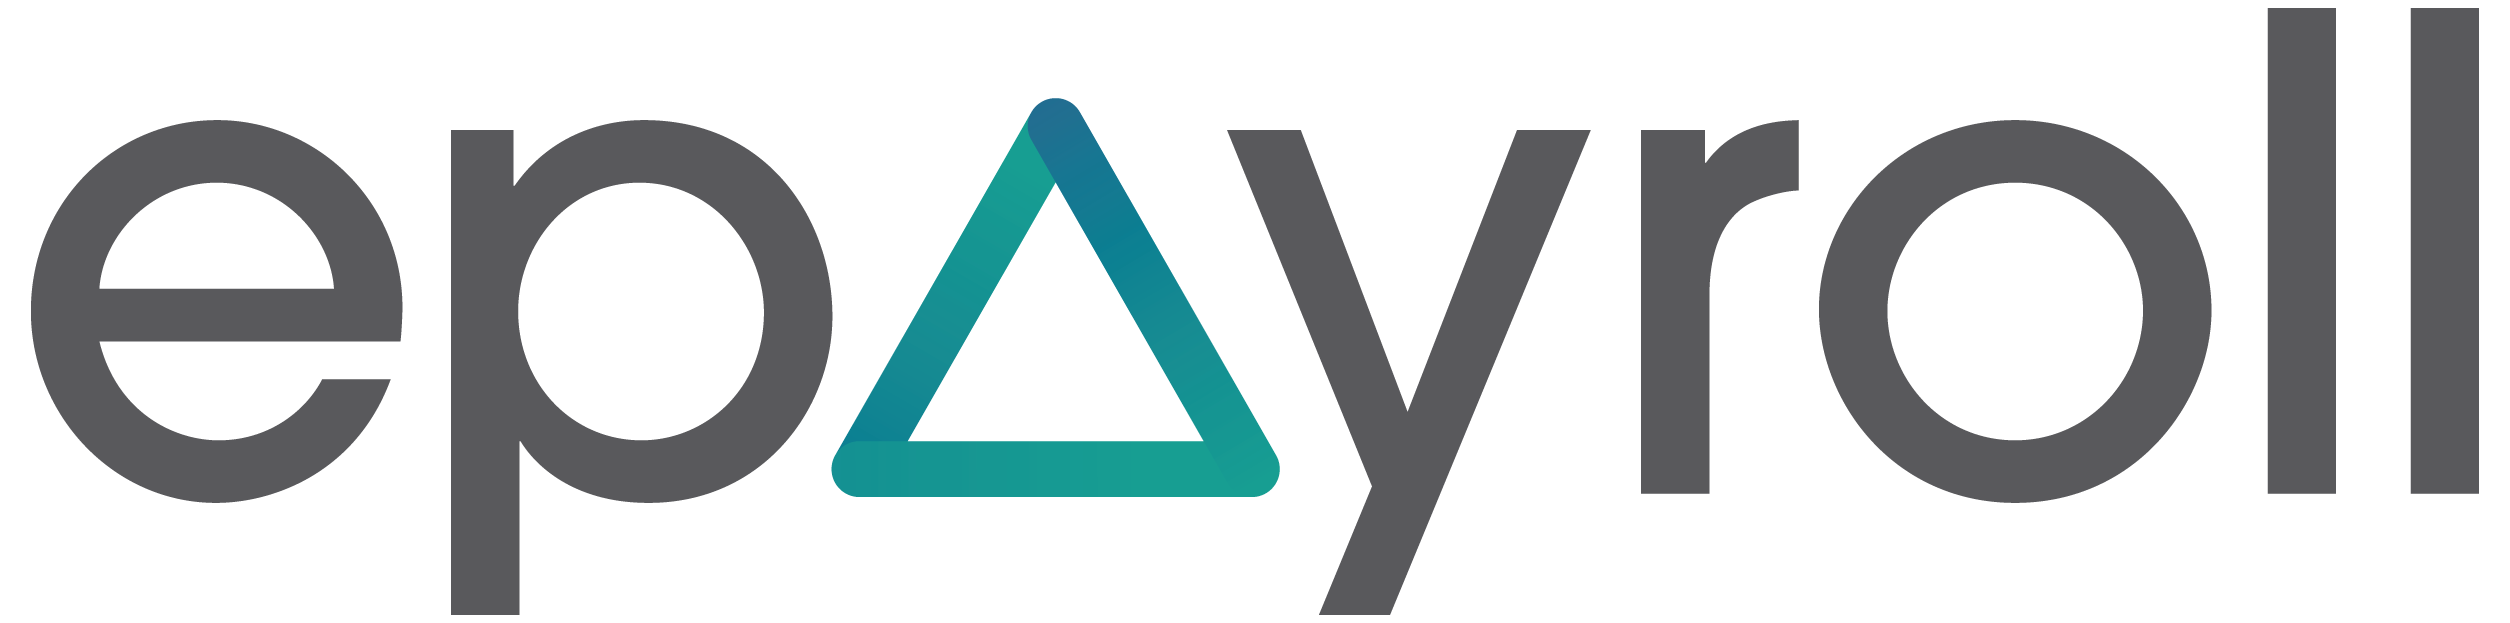 ePayroll & AussiePay